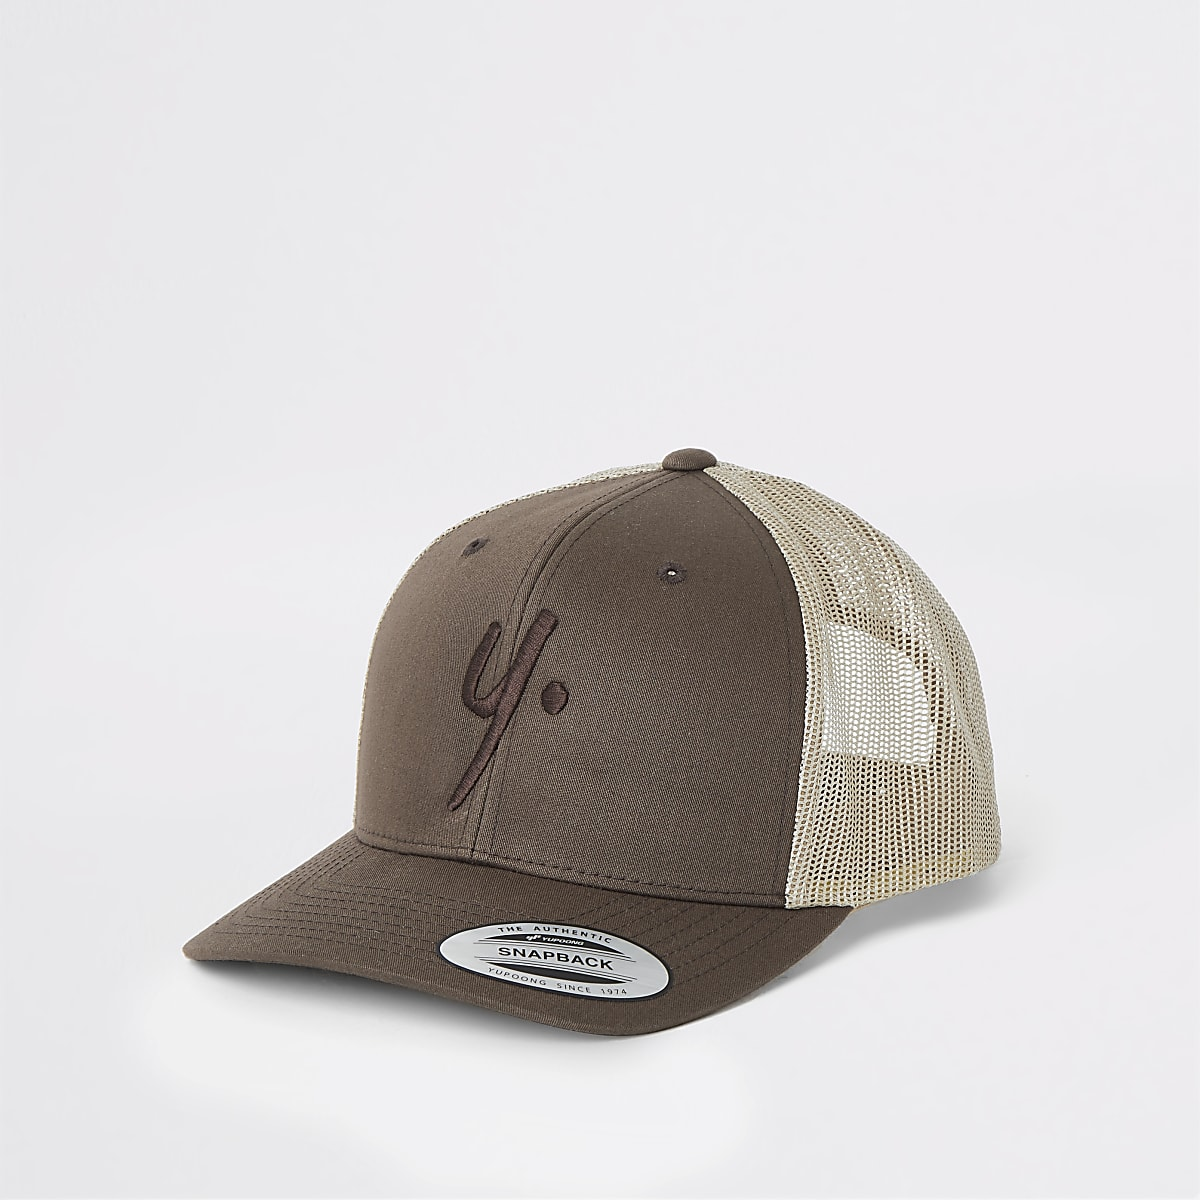 Year Dot brown baseball cap